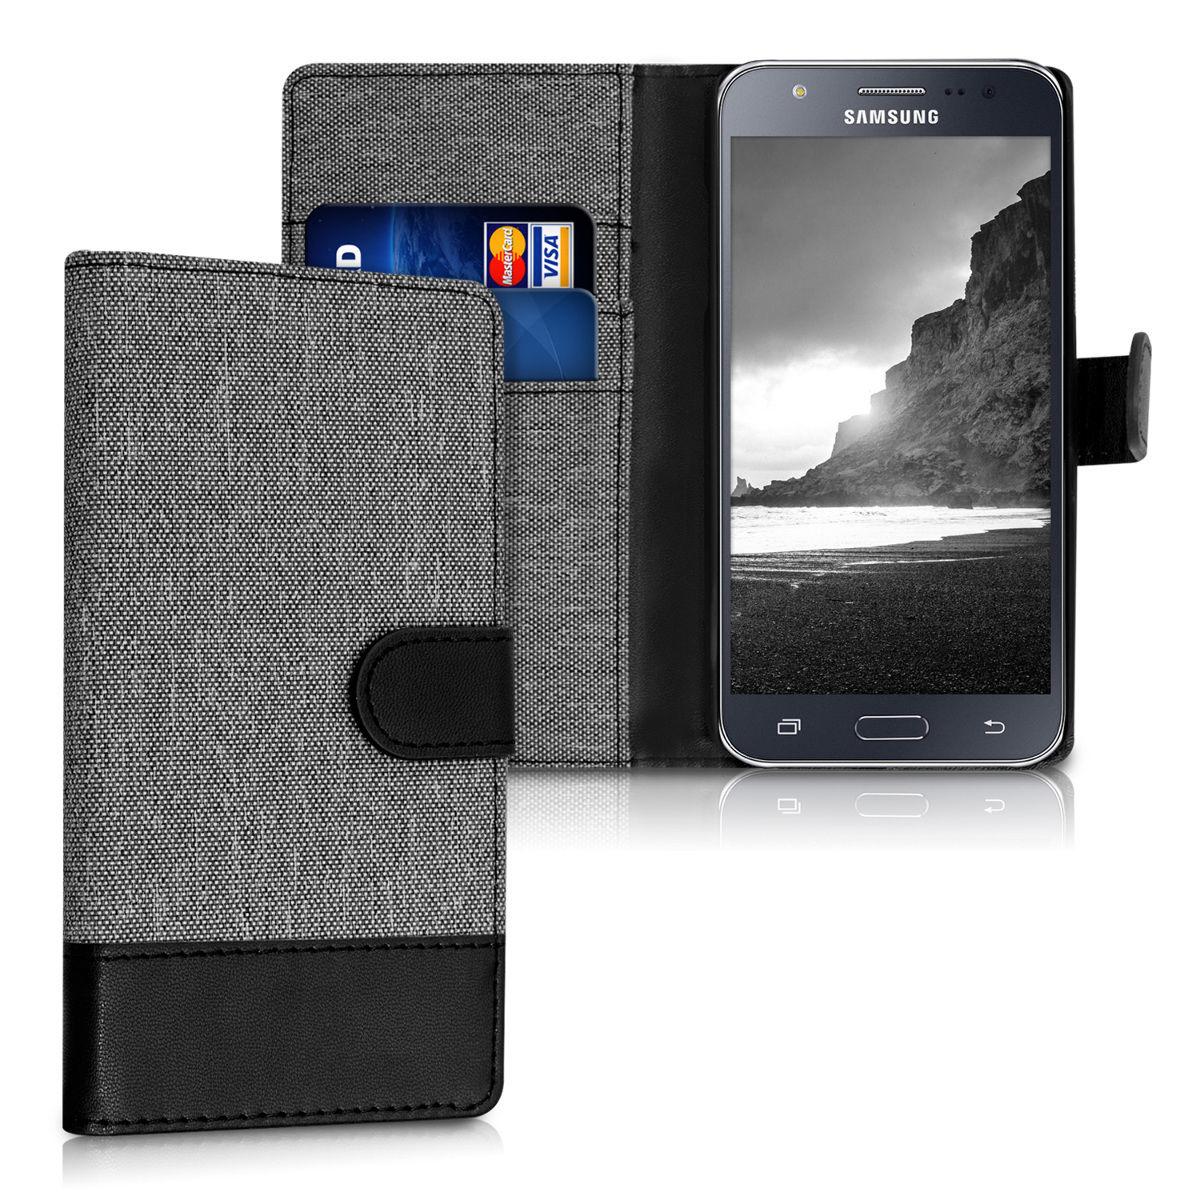 Pouzdro pro Samsung Galaxy J5 (2015) šedé